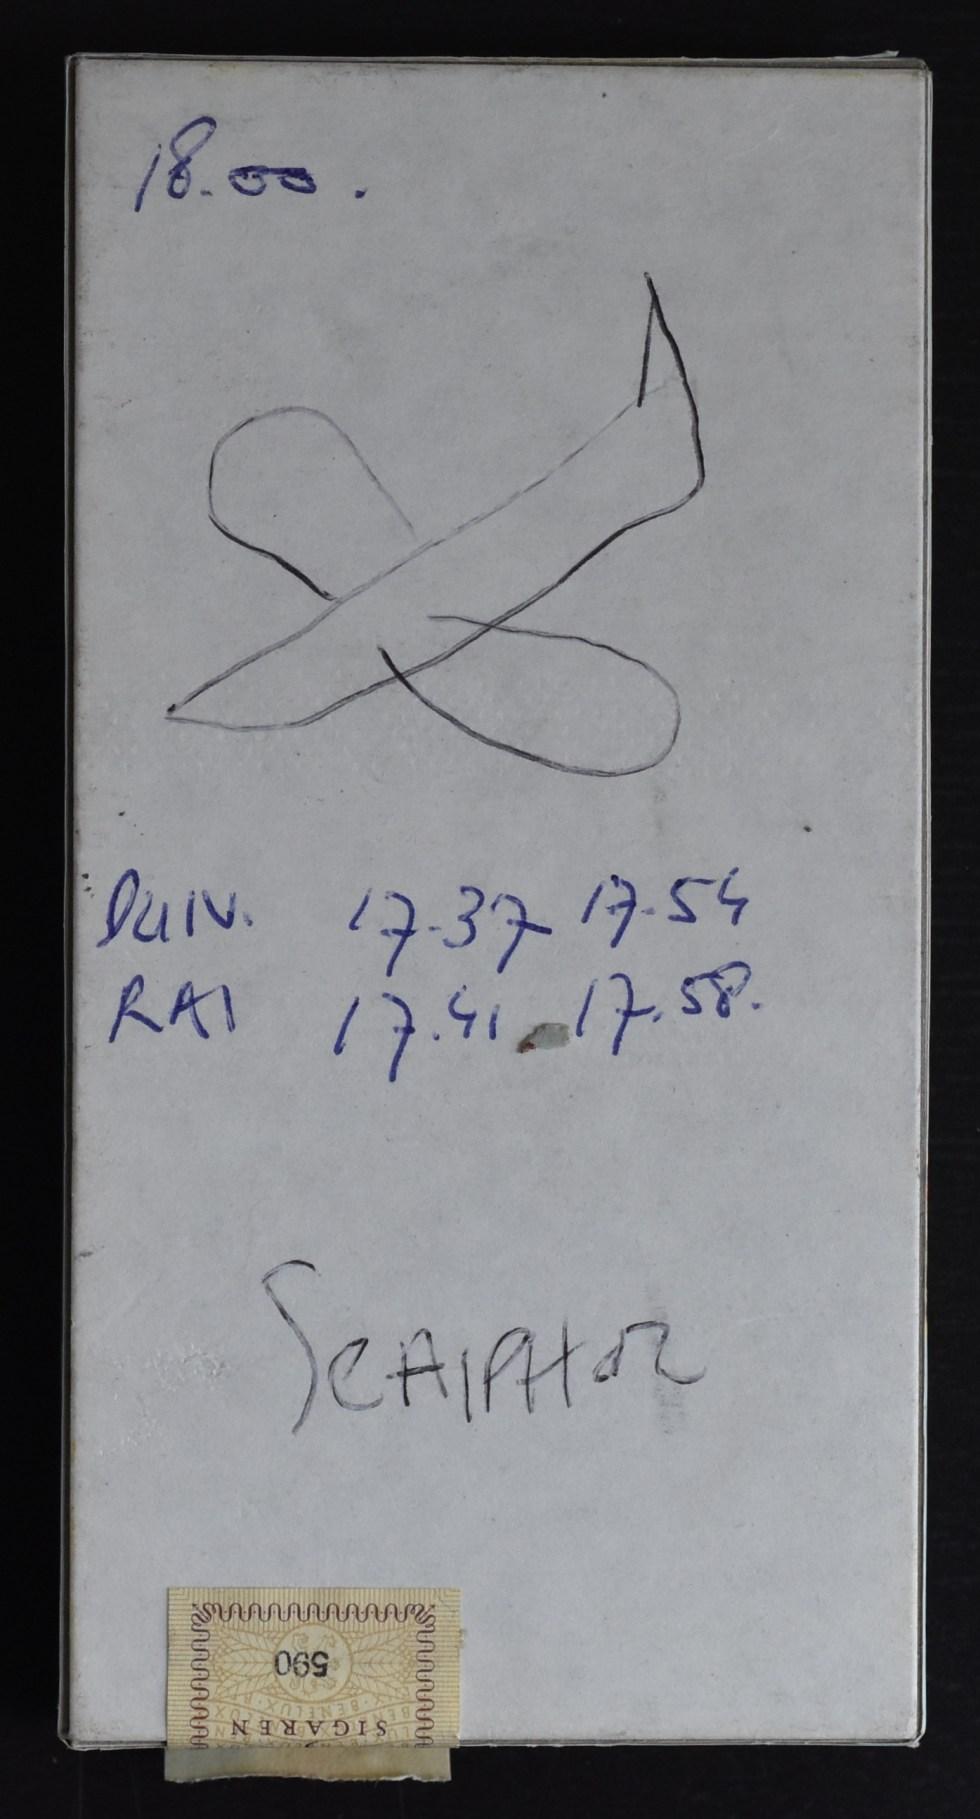 dirkx 449.JPG